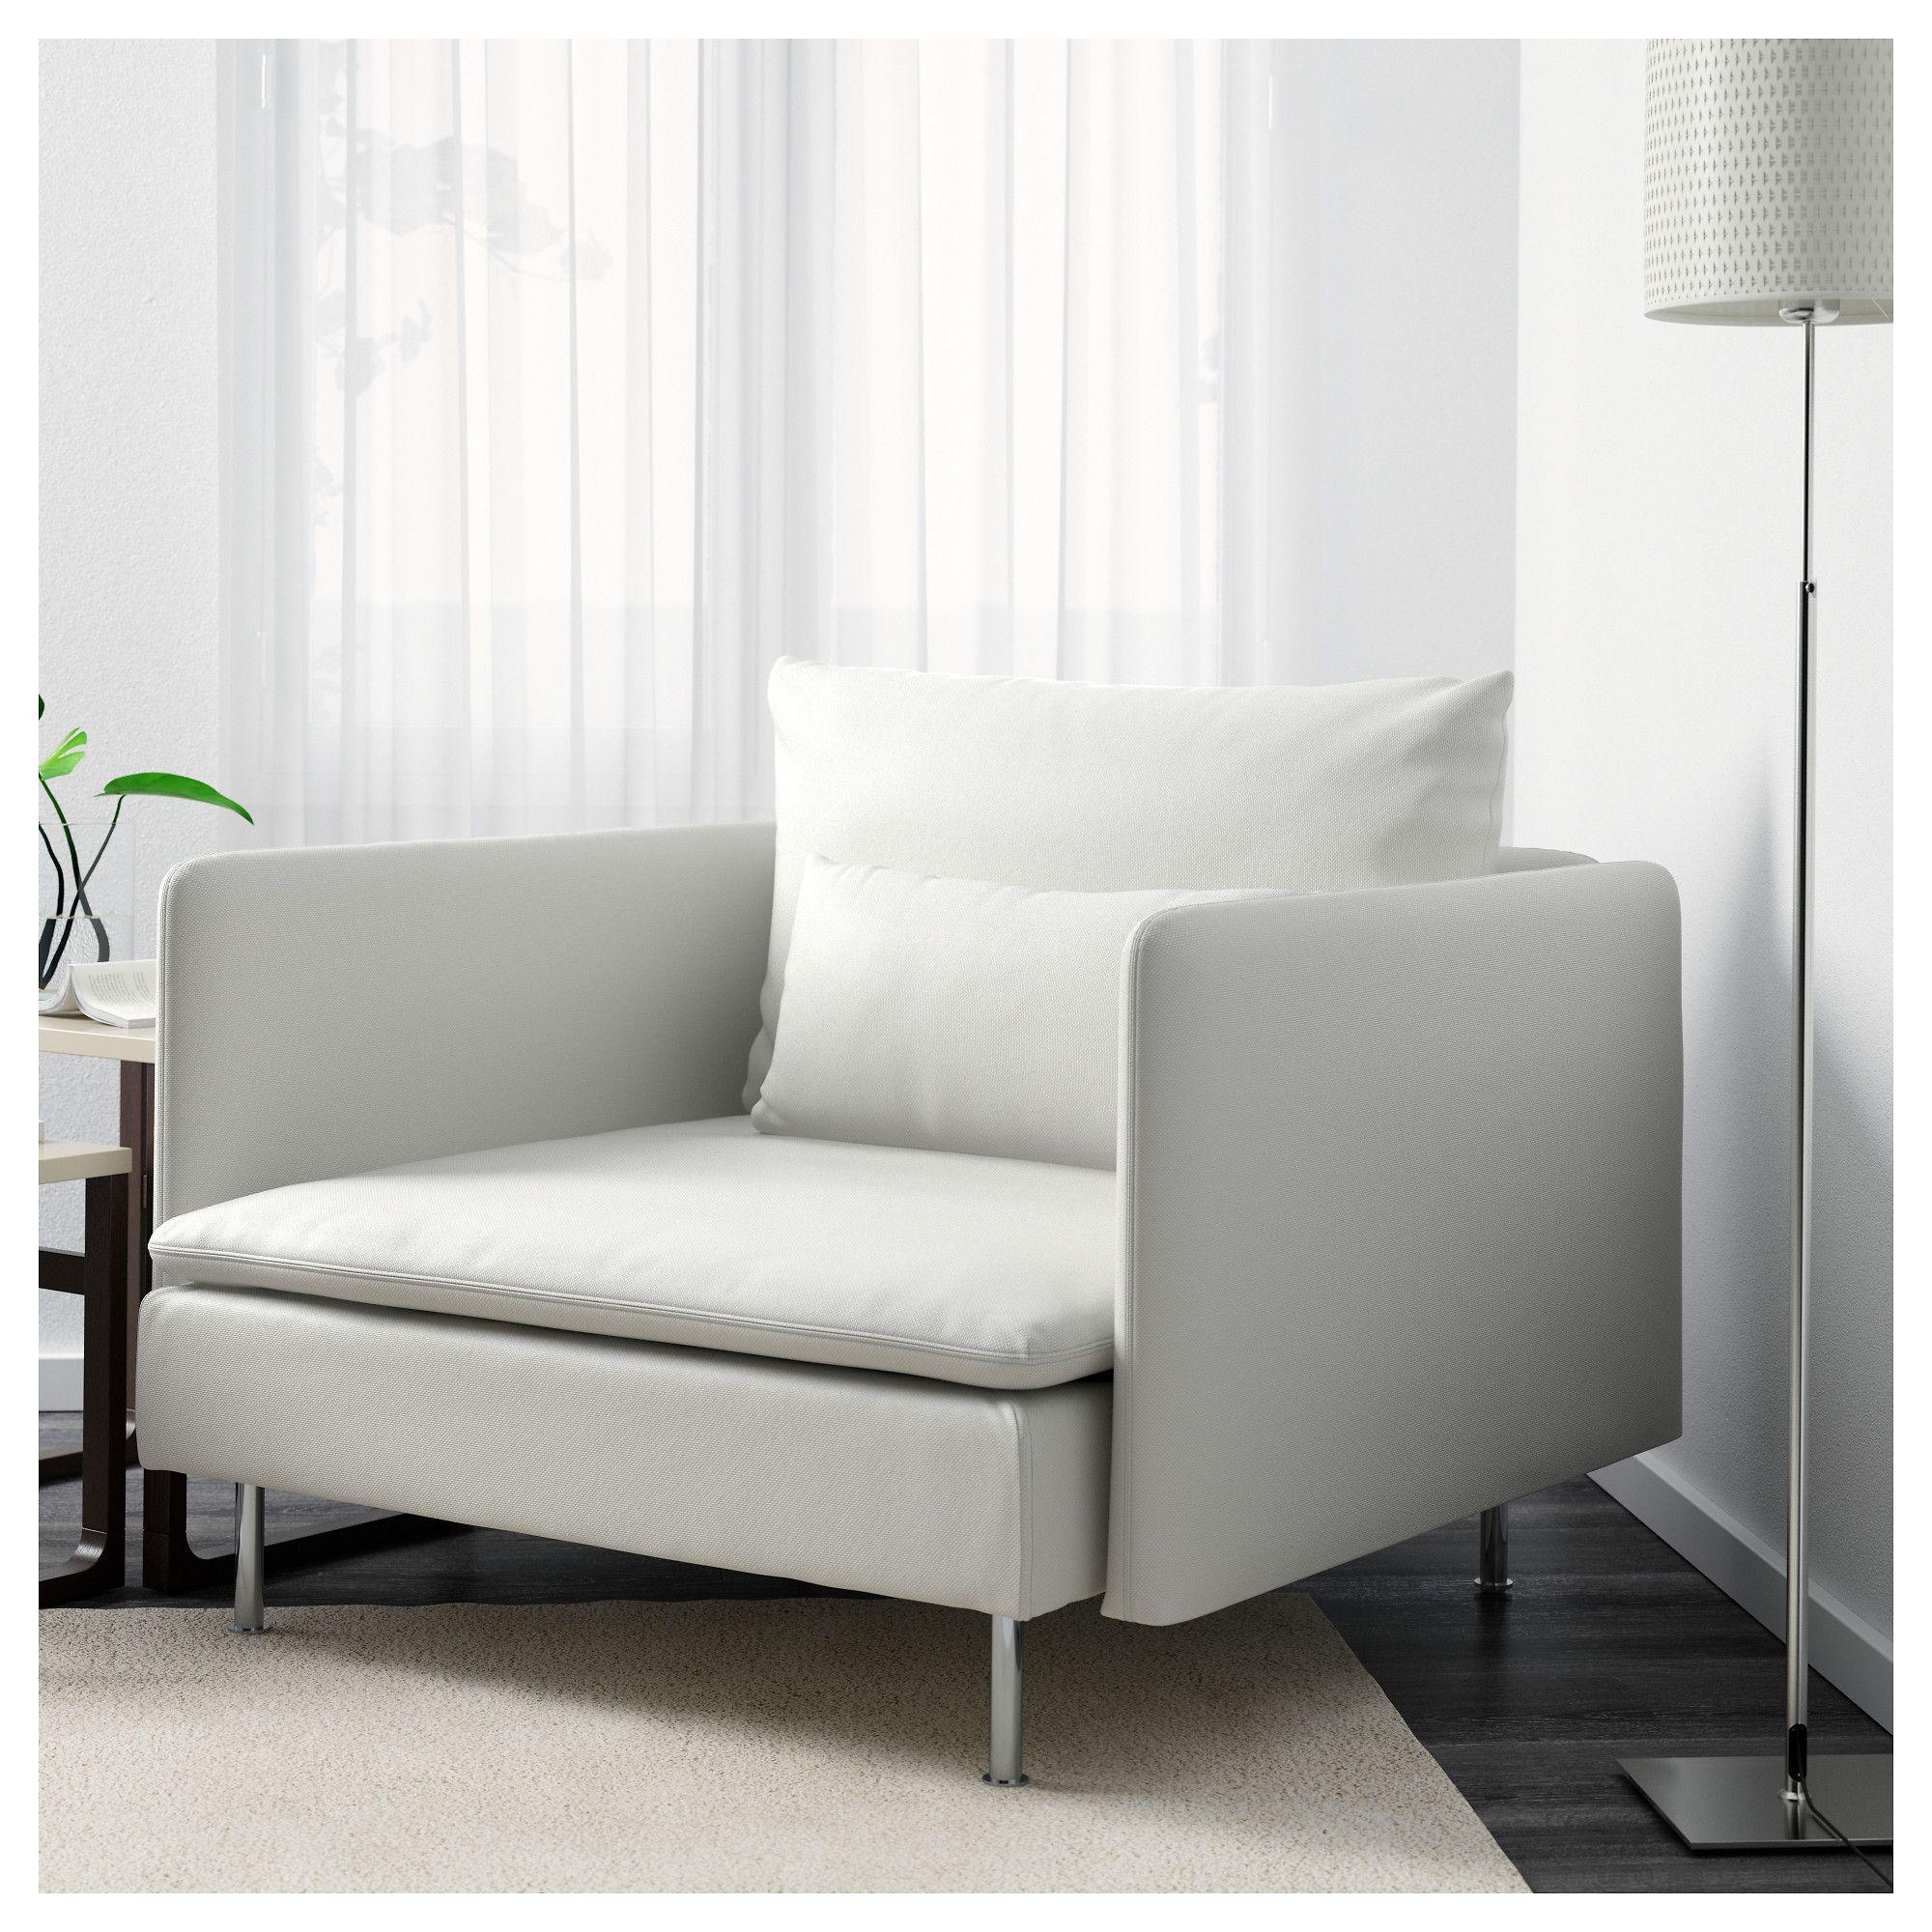 SÖDERHAMN Armchair Finnsta white White chair, Armchair